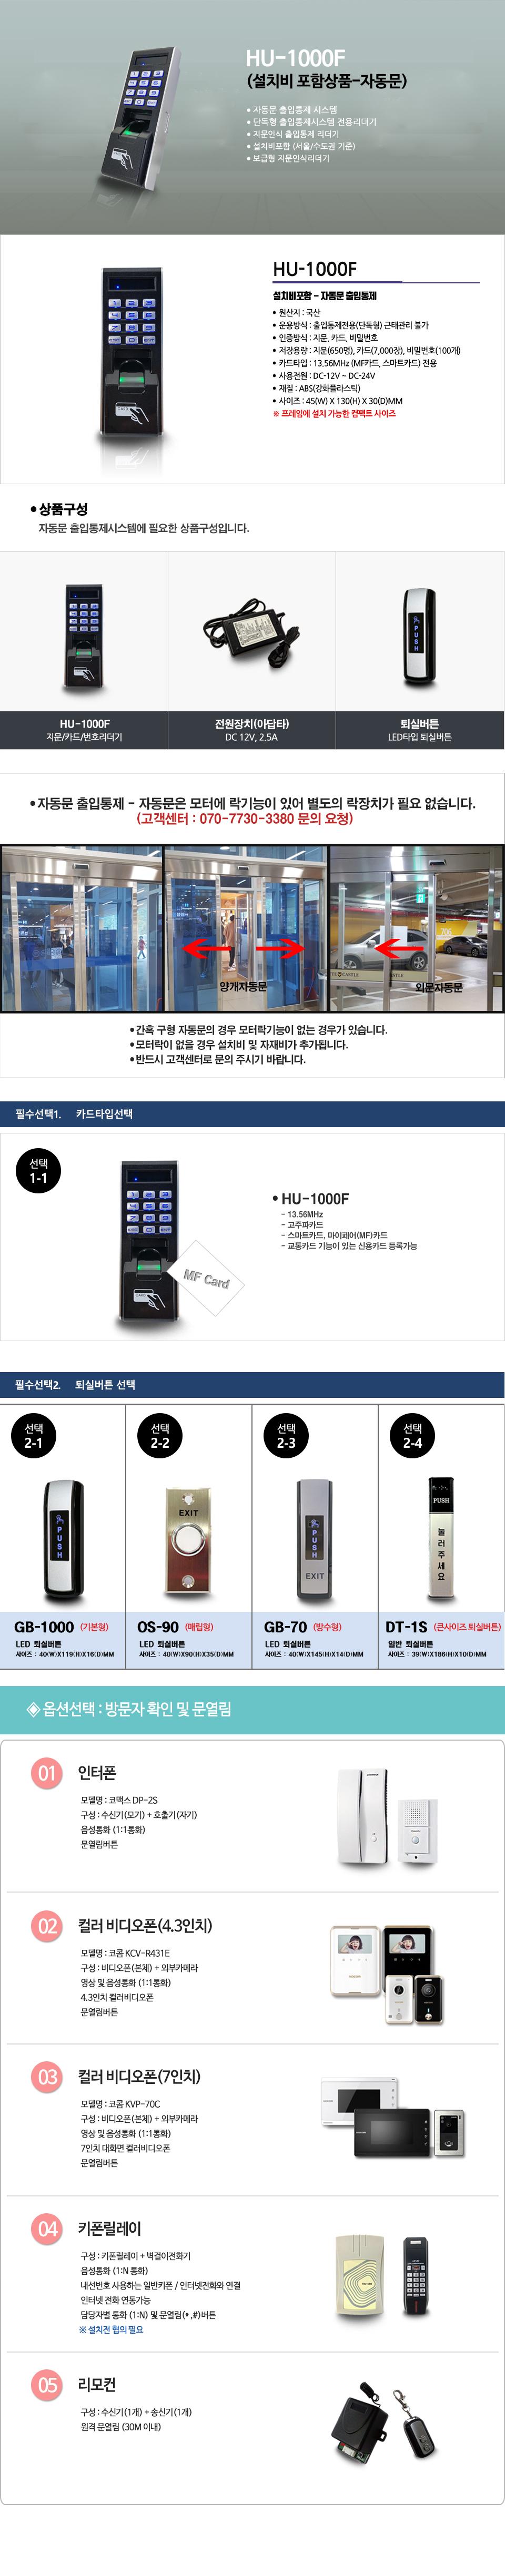 HU-1000F설치비포함작업-자동문.jpg